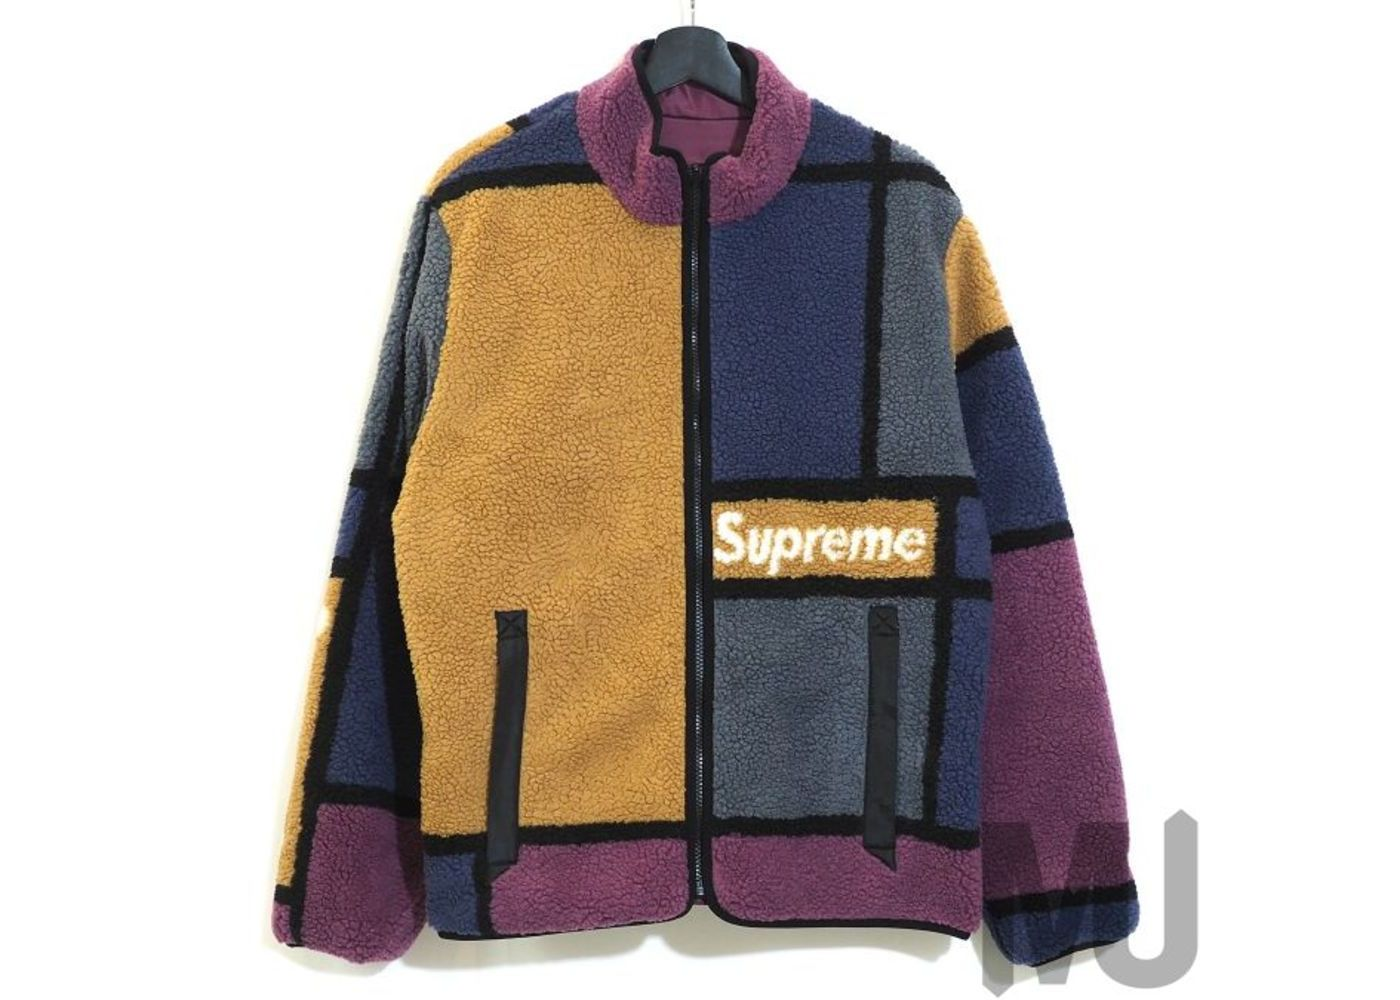 Supreme Reversible Colorblocked Fleece Jacket Purpleの写真